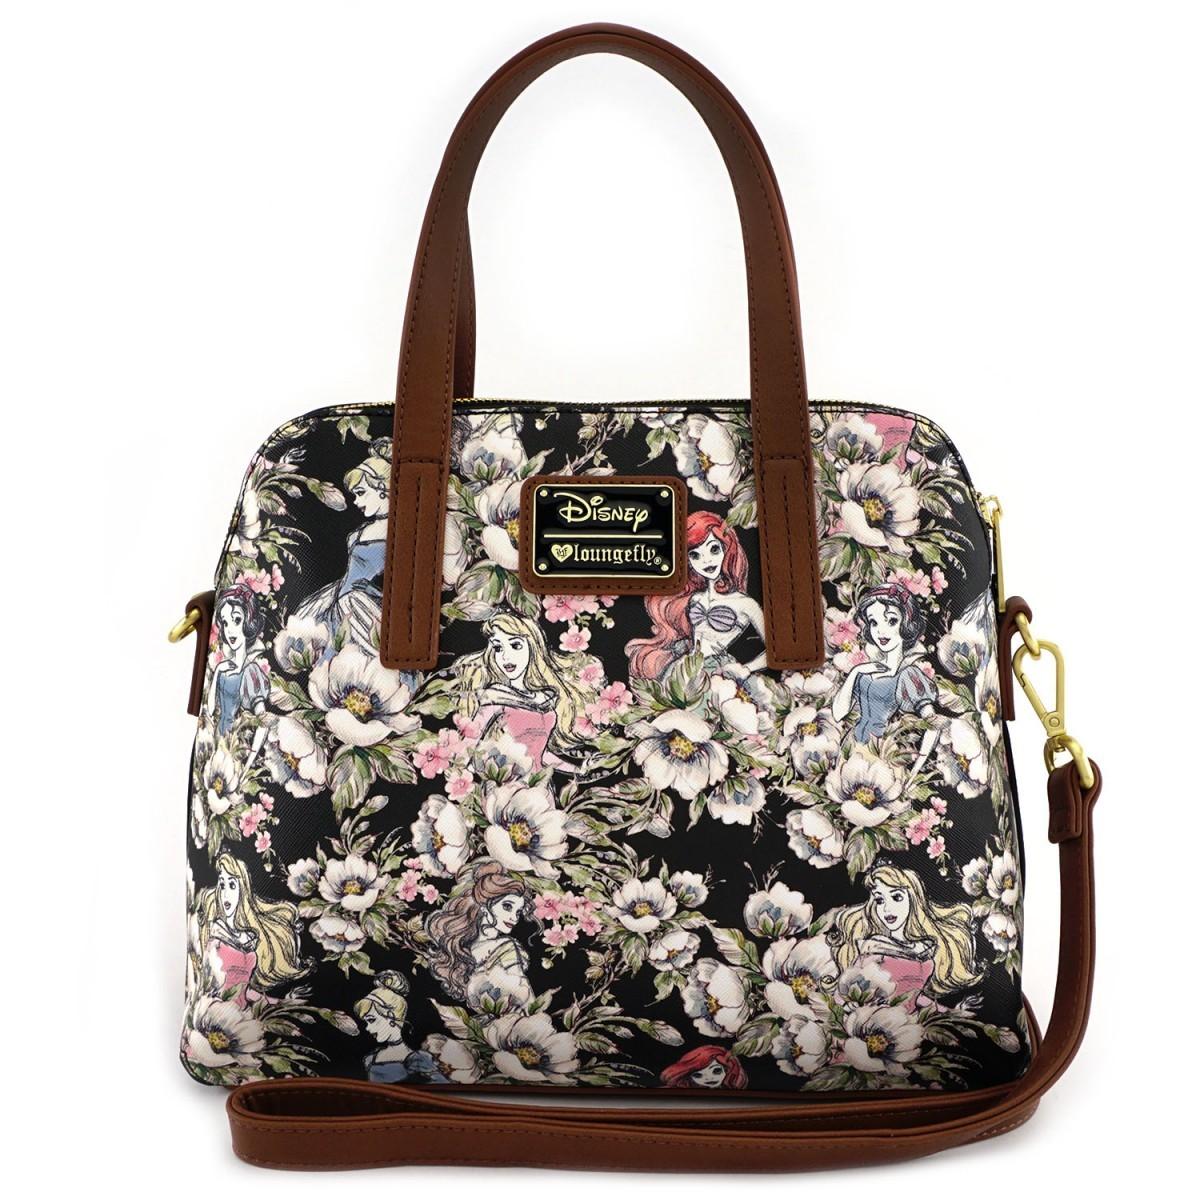 Disney Princesses - Floral Crossbody Bag | Womenu0026#39;s | At Mighty Ape NZ